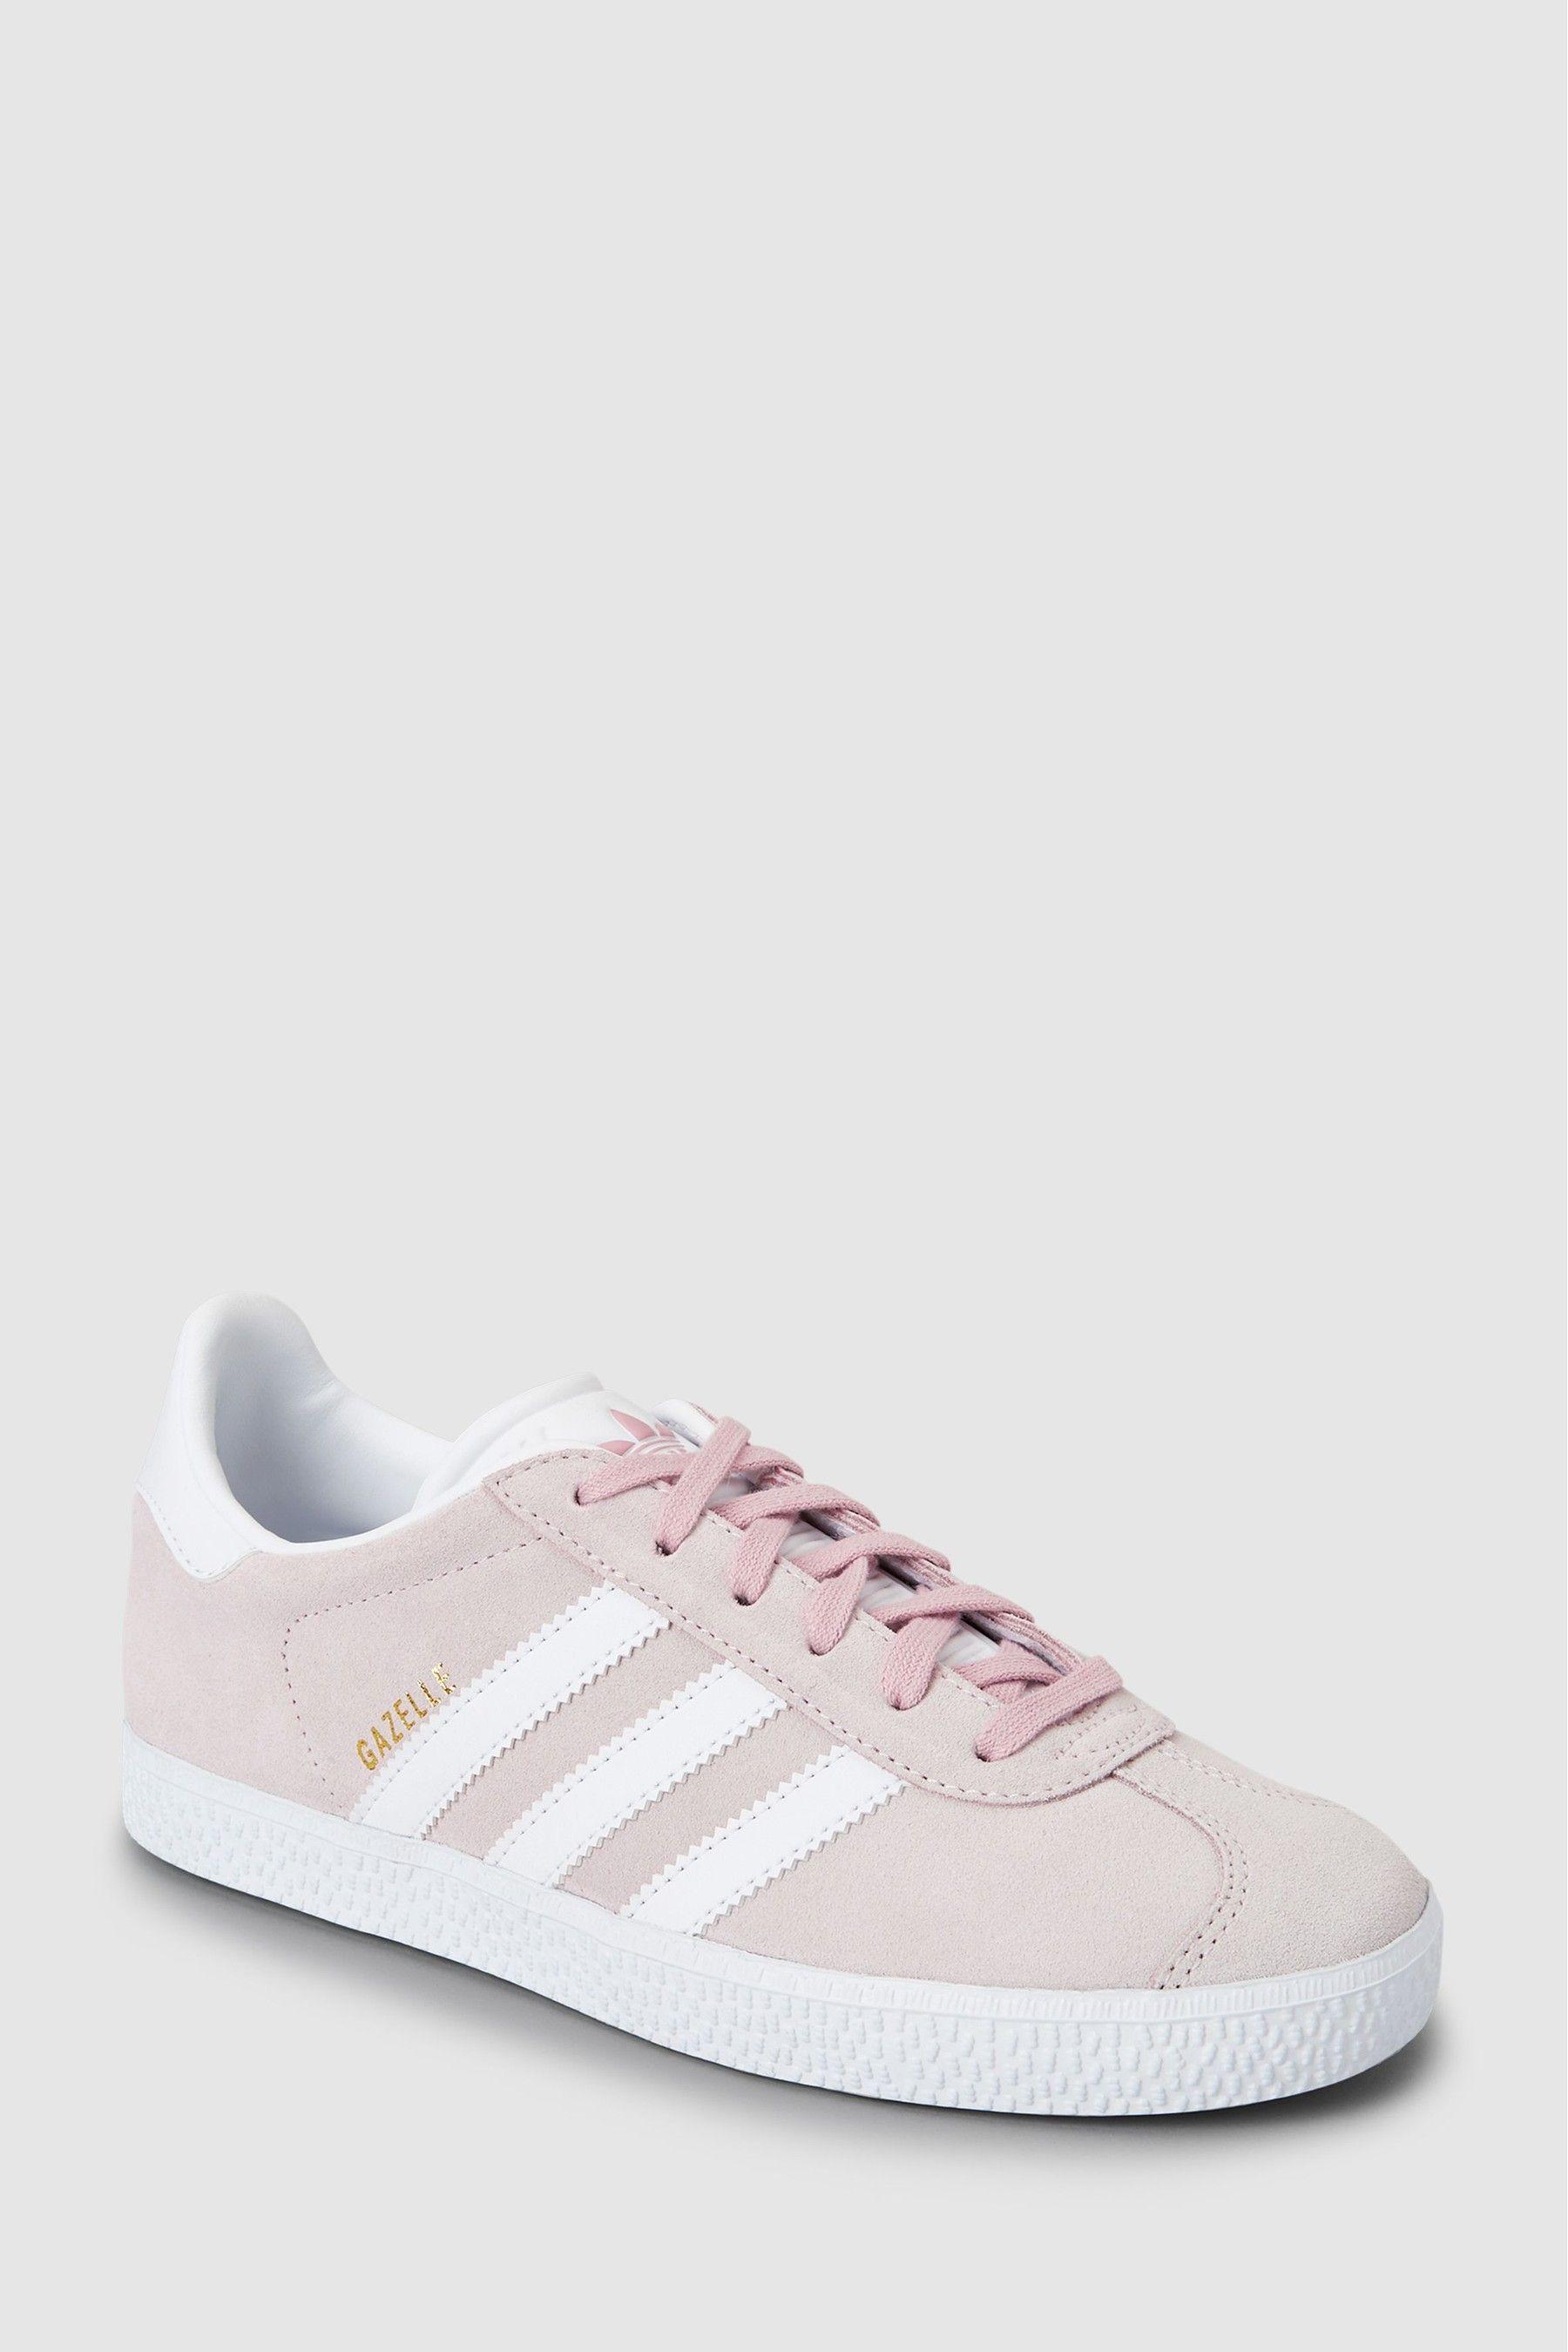 adidas Originals Pink Gazelle Youth